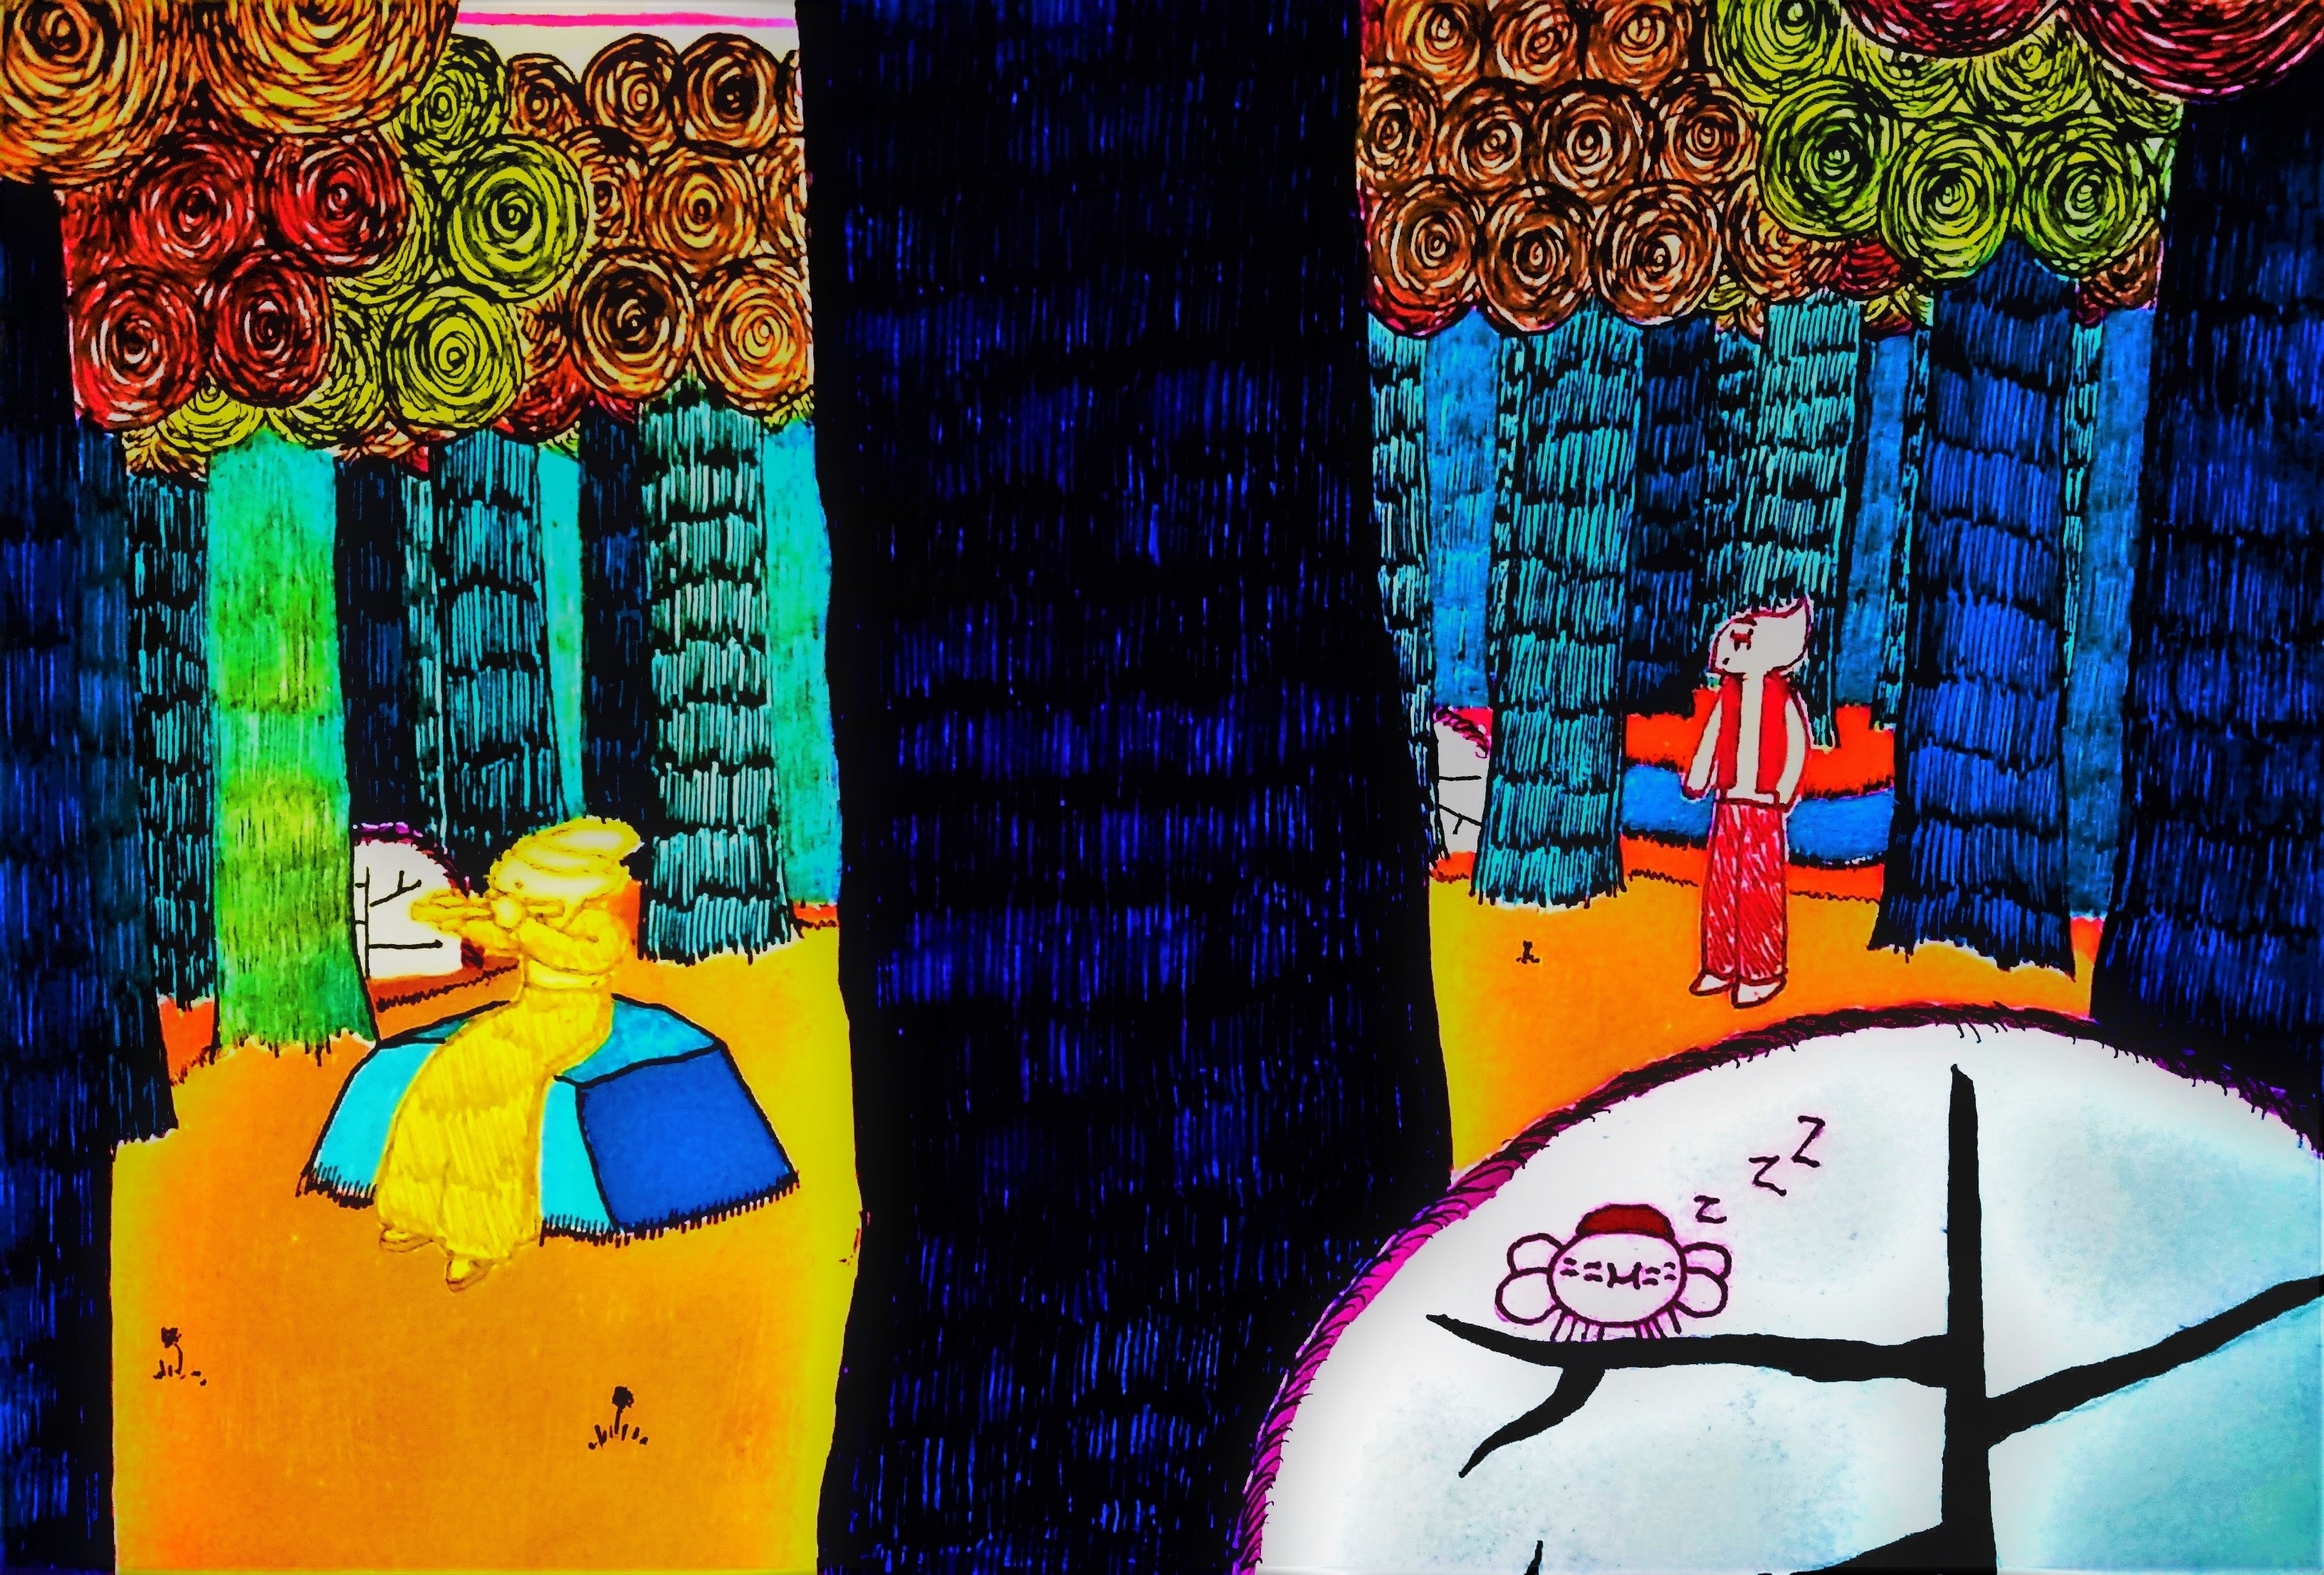 Pillar Forest Day 3 - Magicka Bipolaroid pg 61